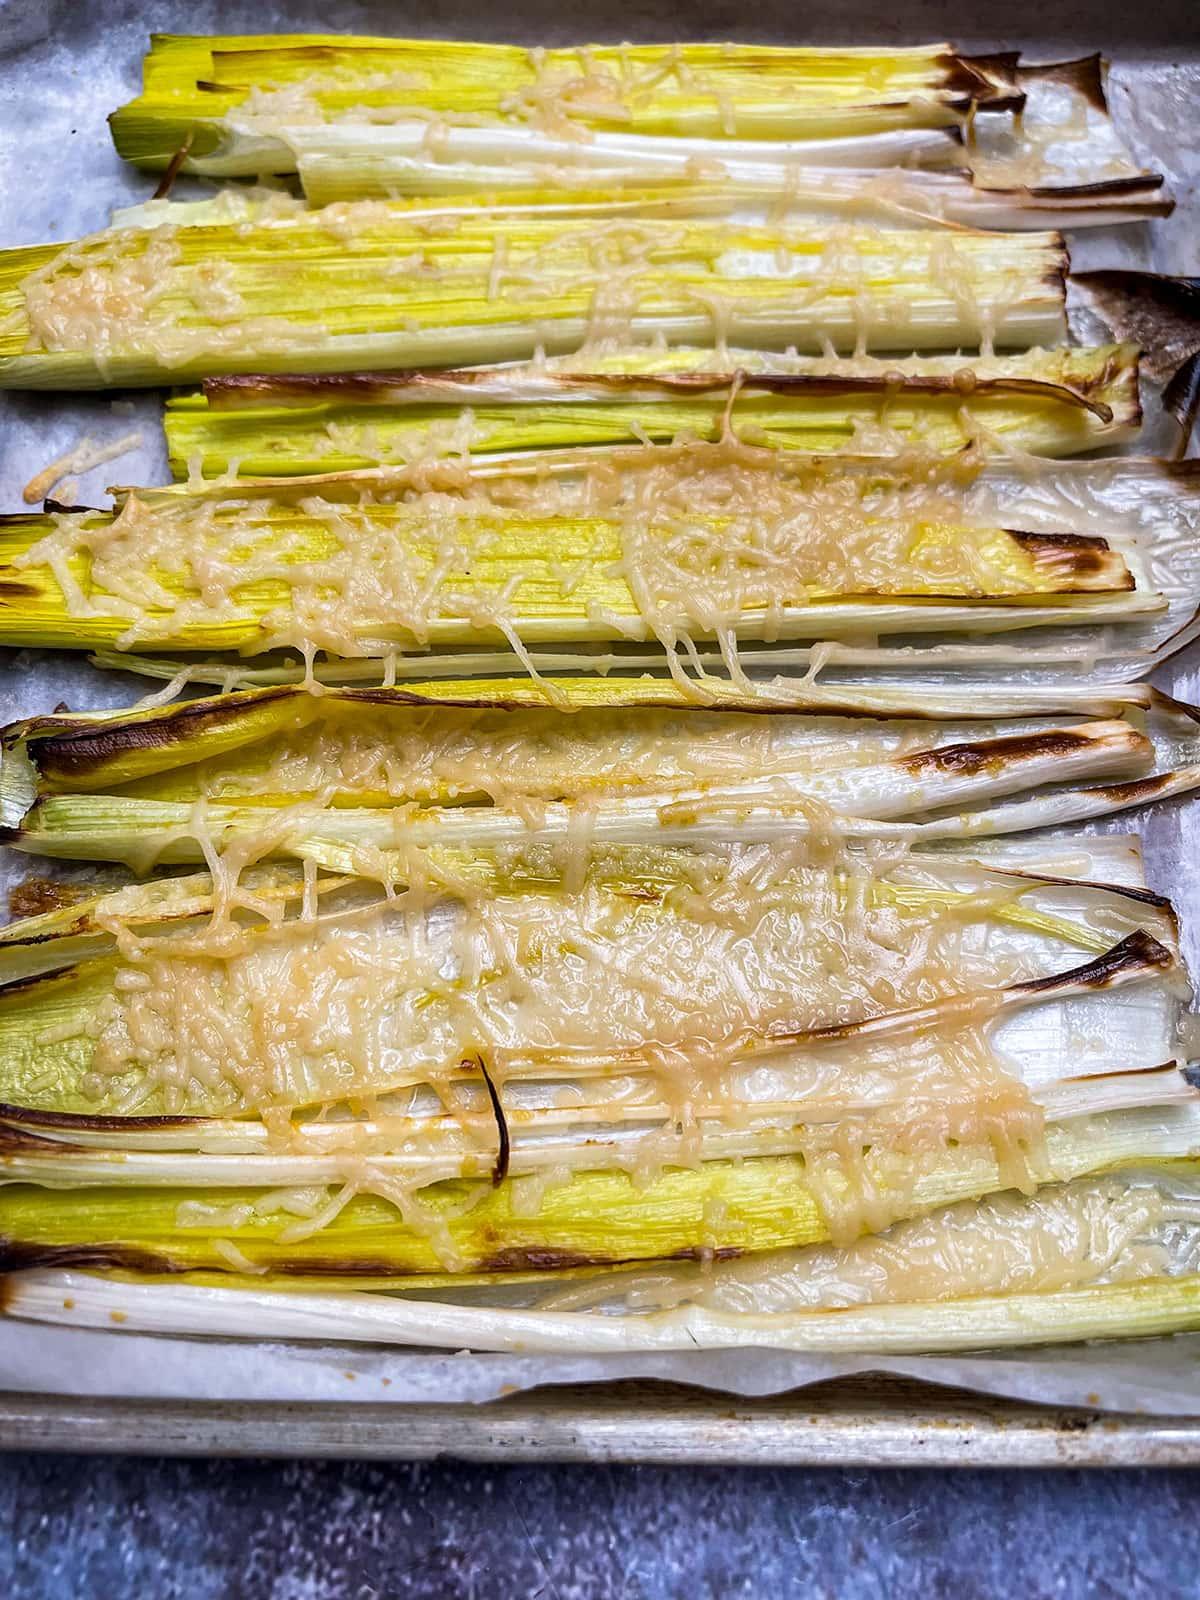 roasted leeks in baking sheet, close view